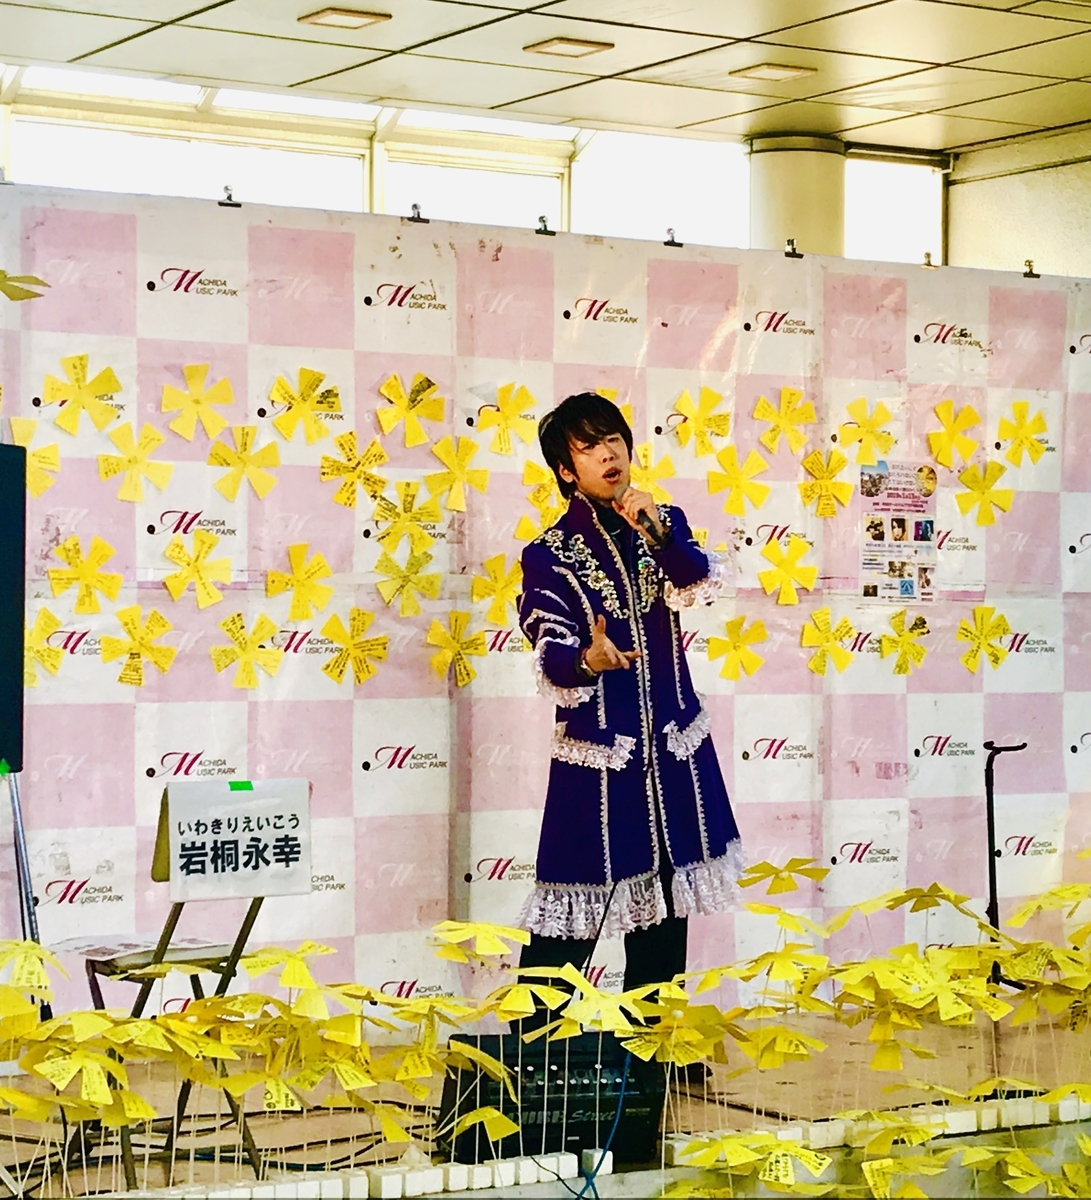 f:id:KizunaKiraKira:20191002230319j:plain